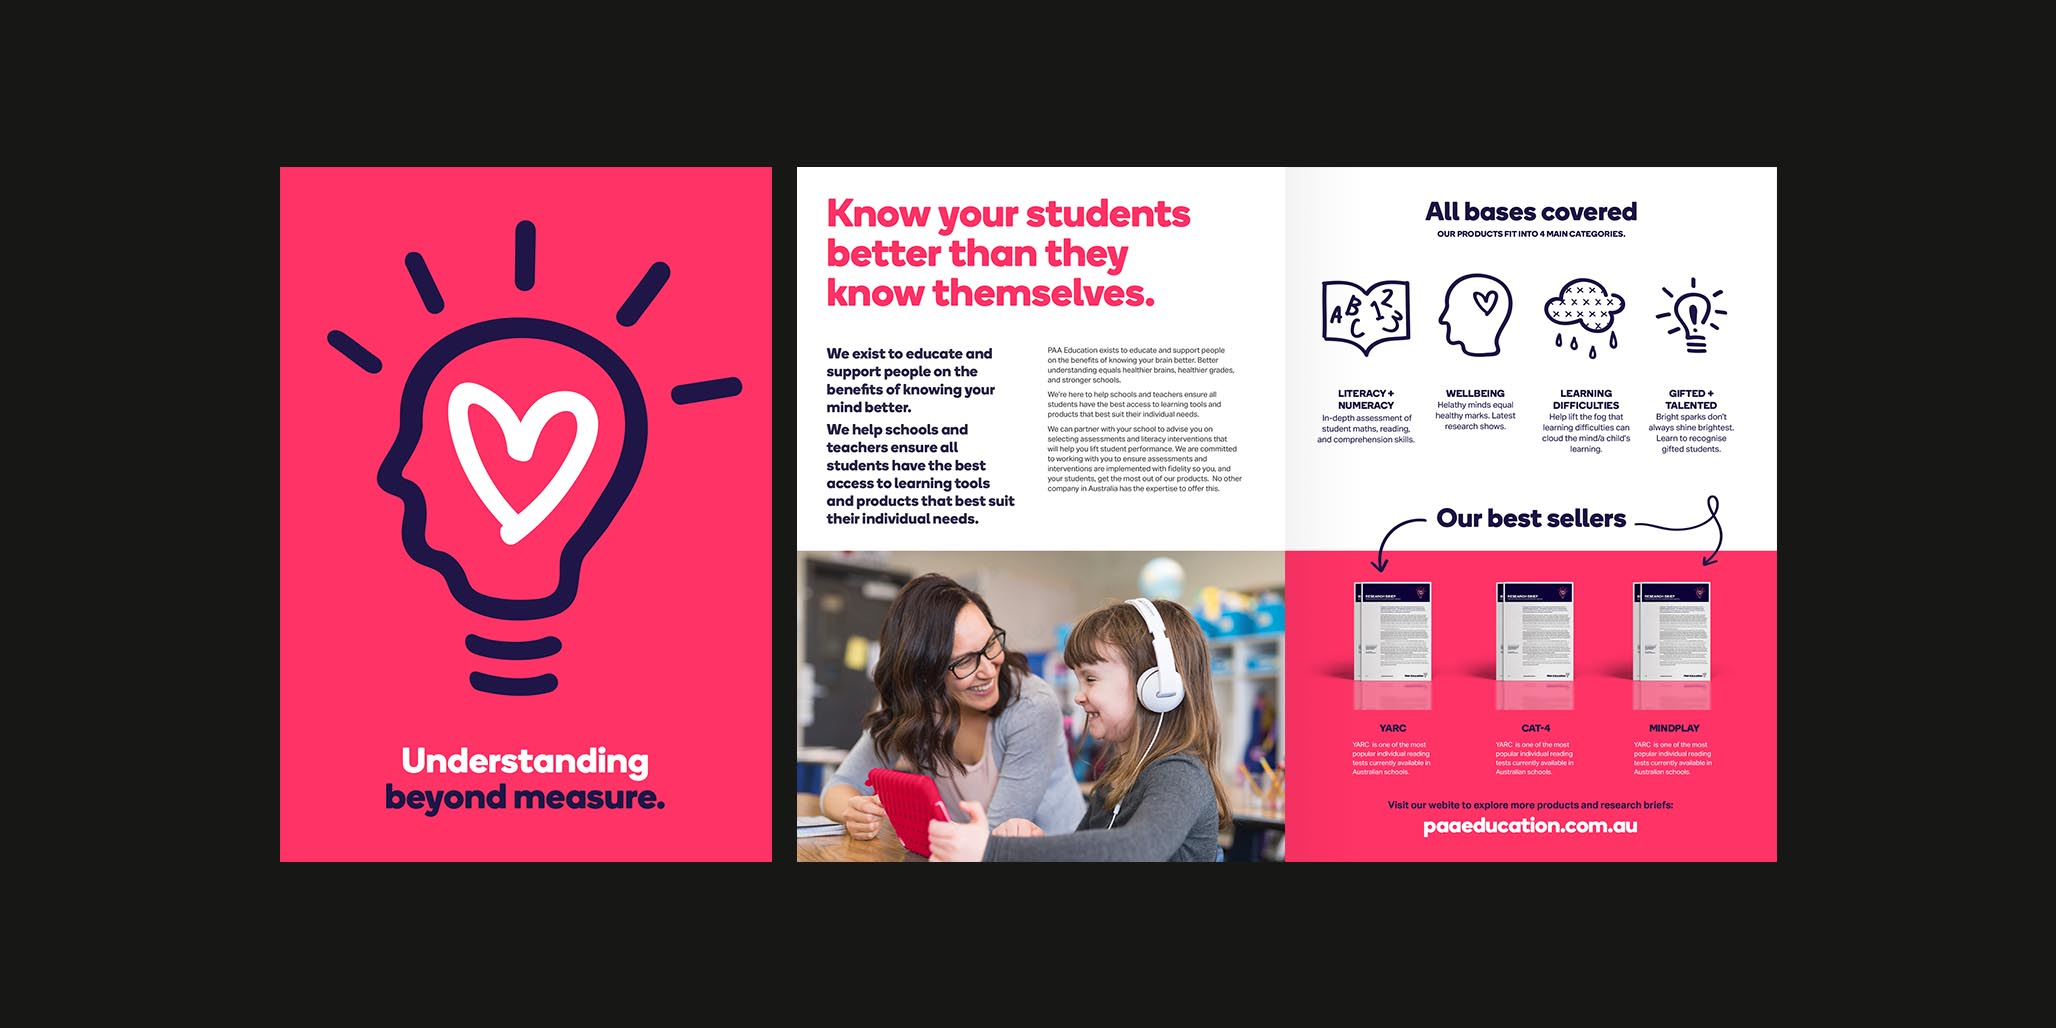 Branding Services & Website Design project for PAA Education, Sydney, Australia, image landscape H